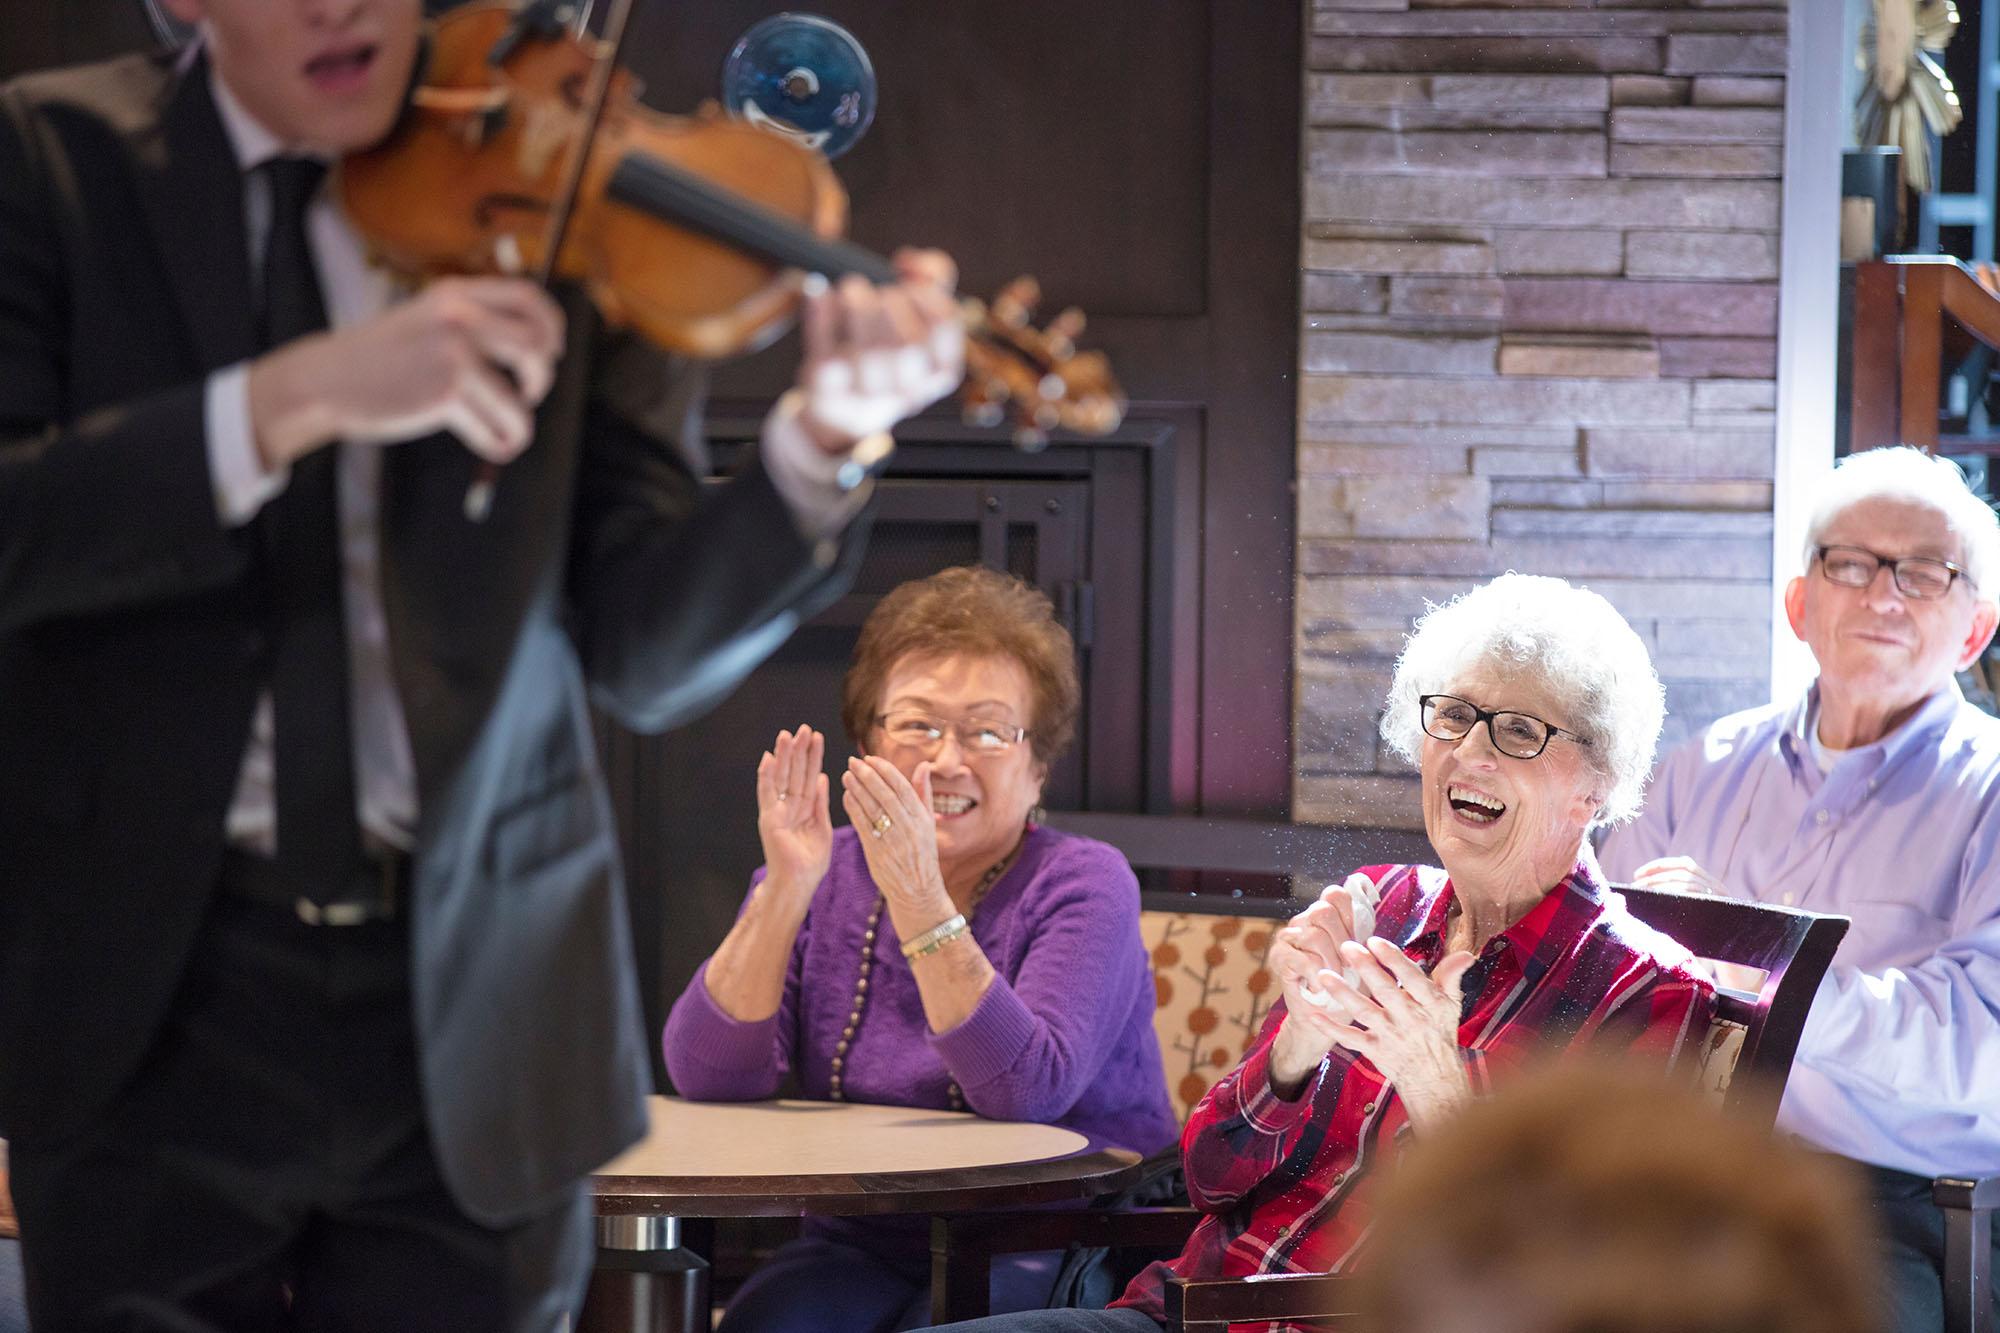 Residents enjoying a show